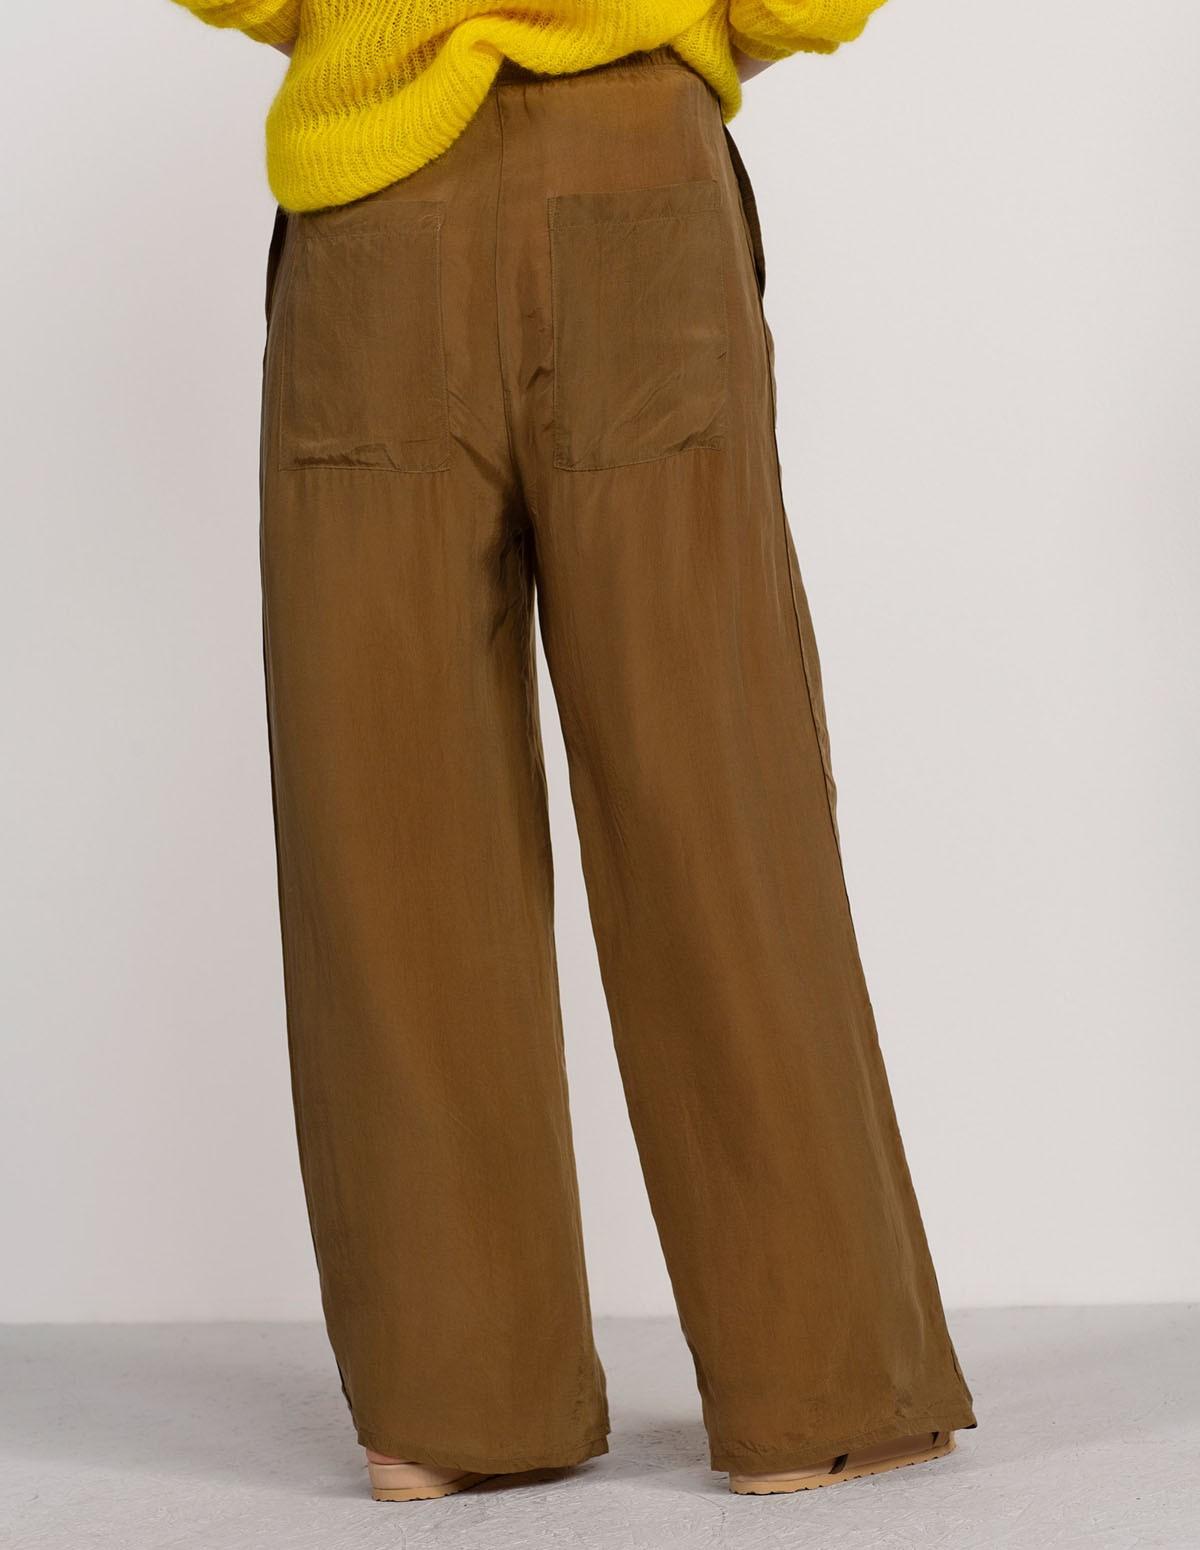 Huma Feis Pants